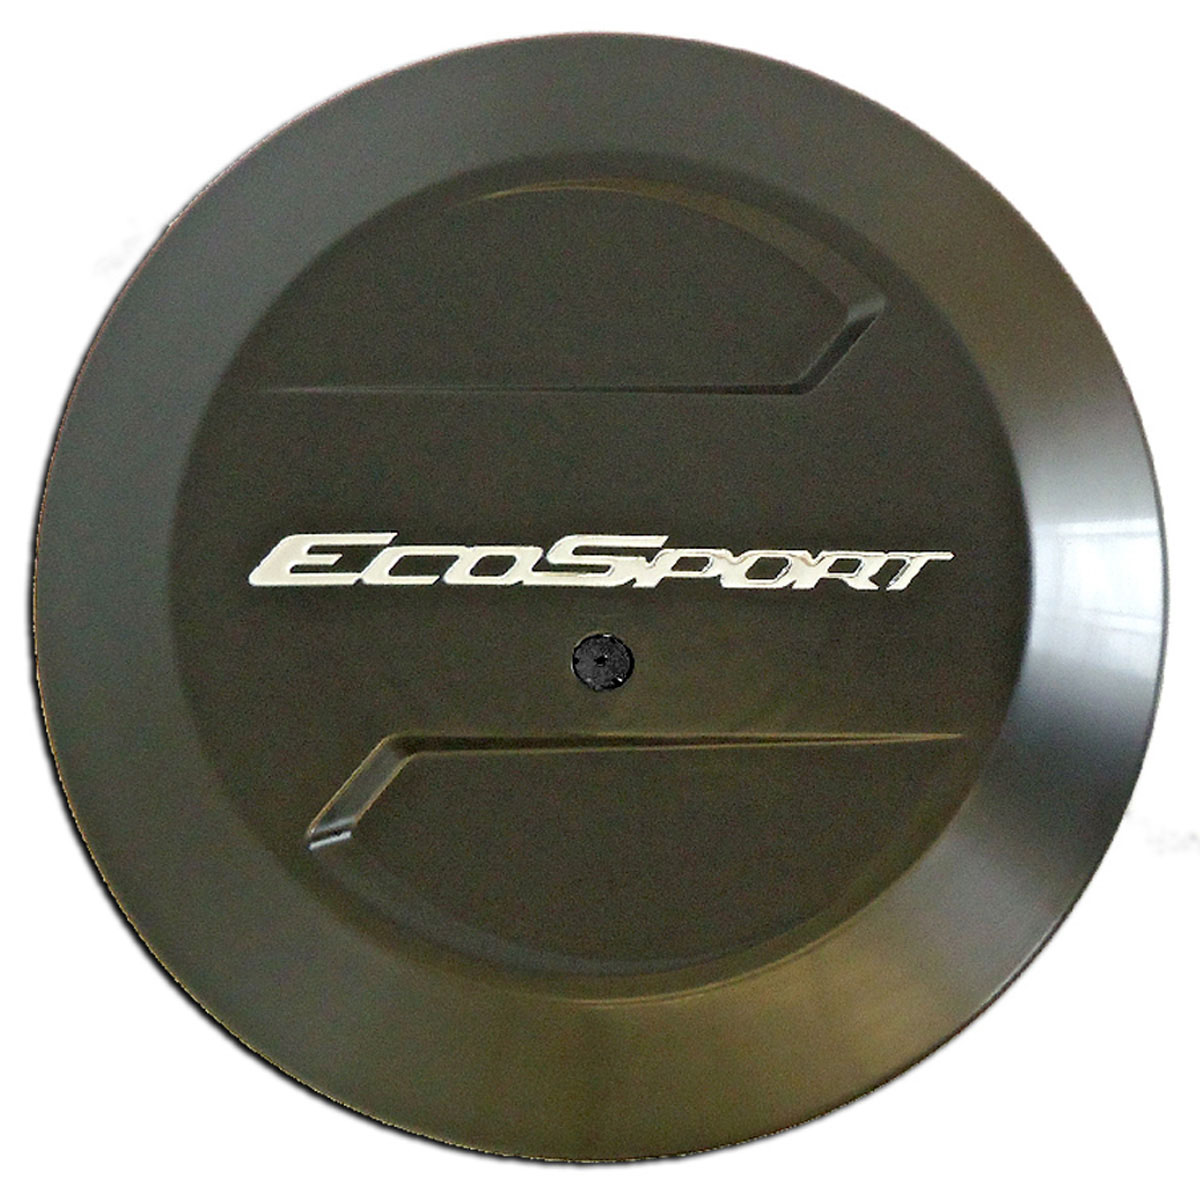 Capa de estepe rígida Ecosport 2003 a 2017 plástico ABS preto